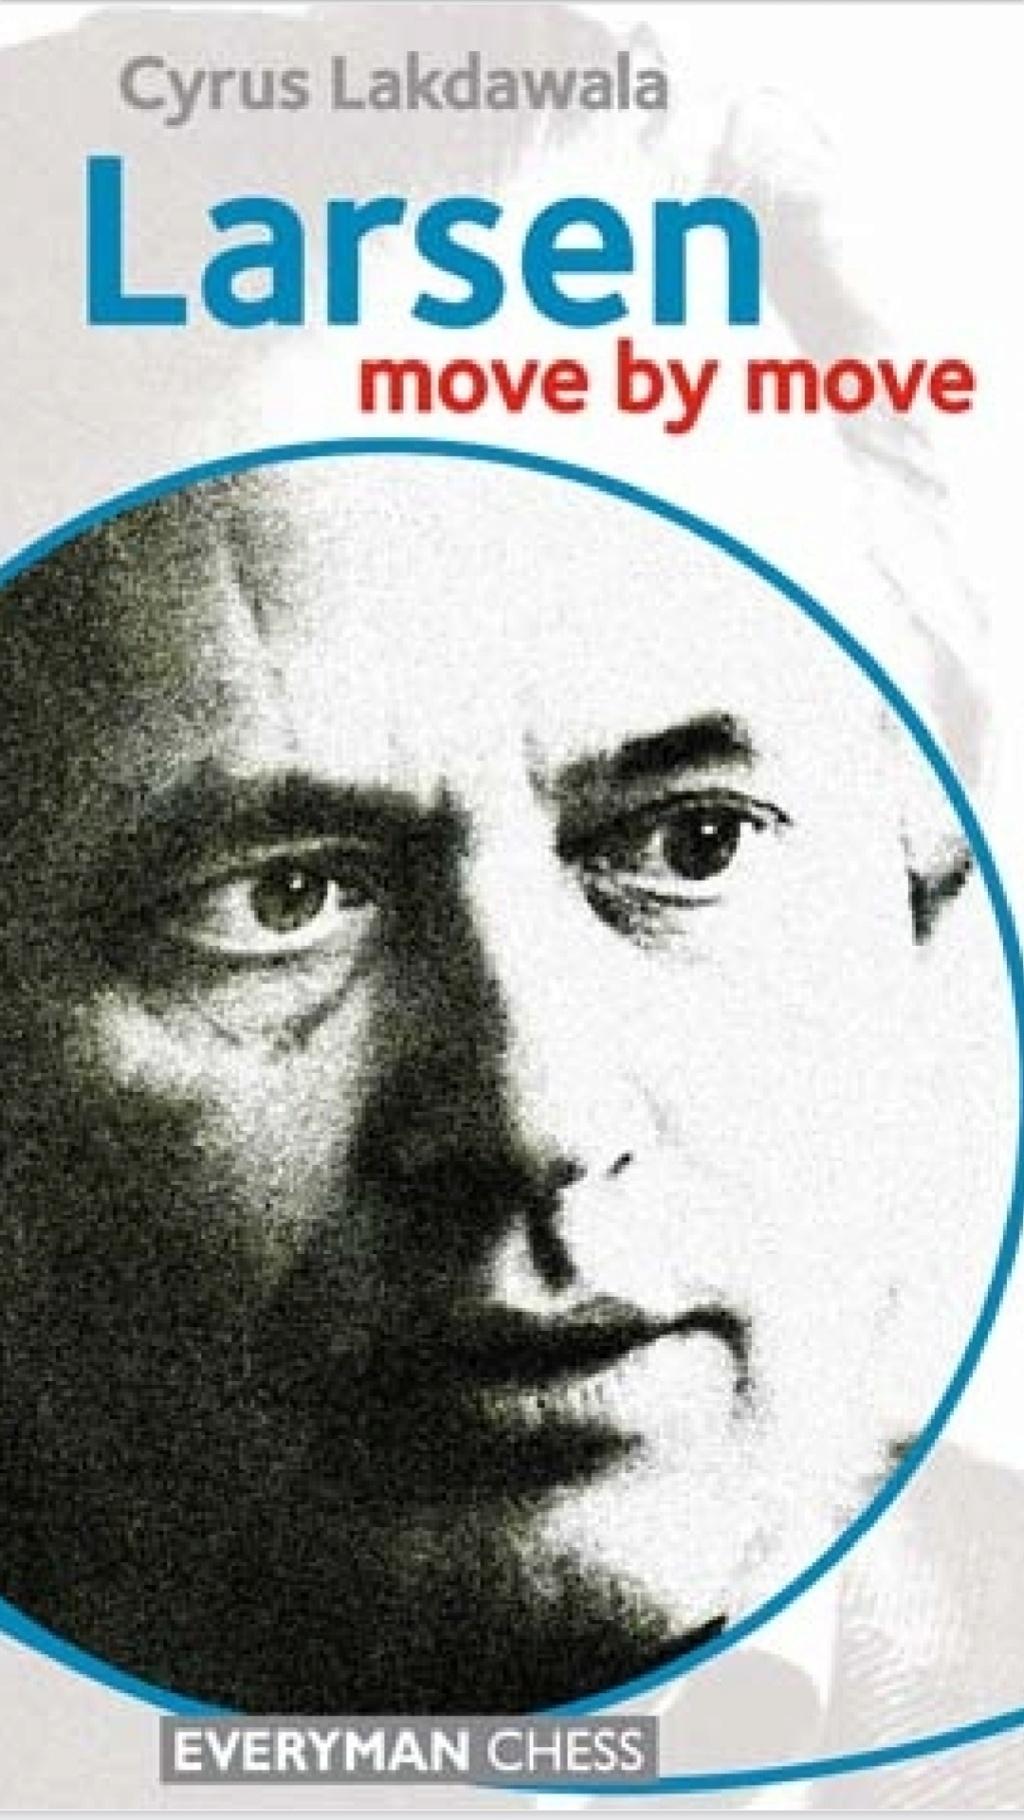 Larsen: Move by Move  Book by C. LAKDAWALA   Scree117